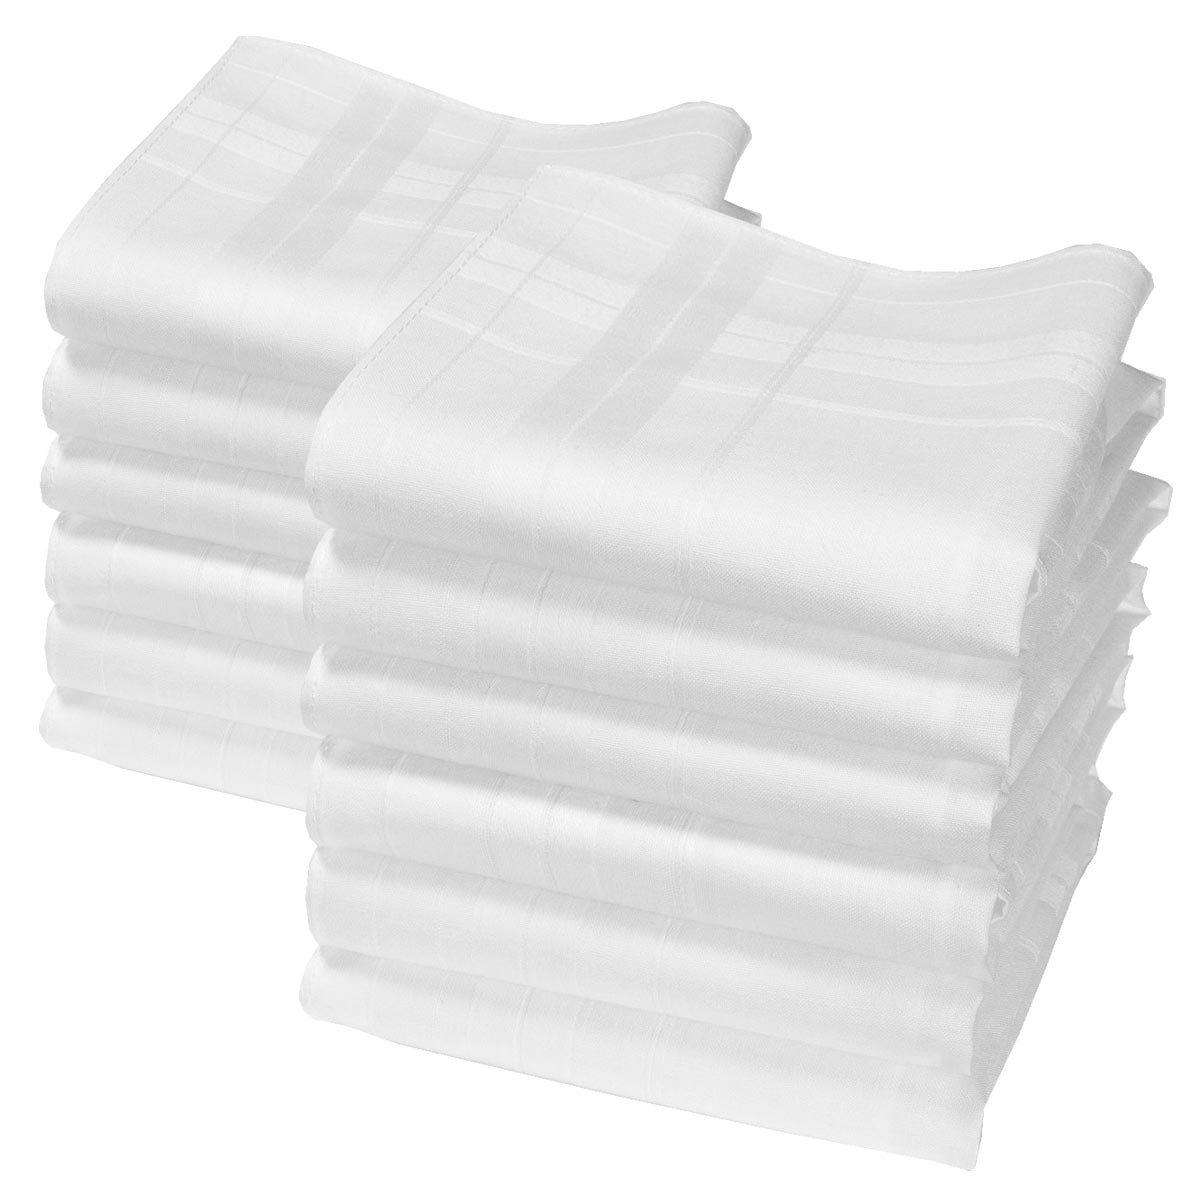 """Camille"" white handkerchiefs - 14"" square - 12 units Merrysquare"